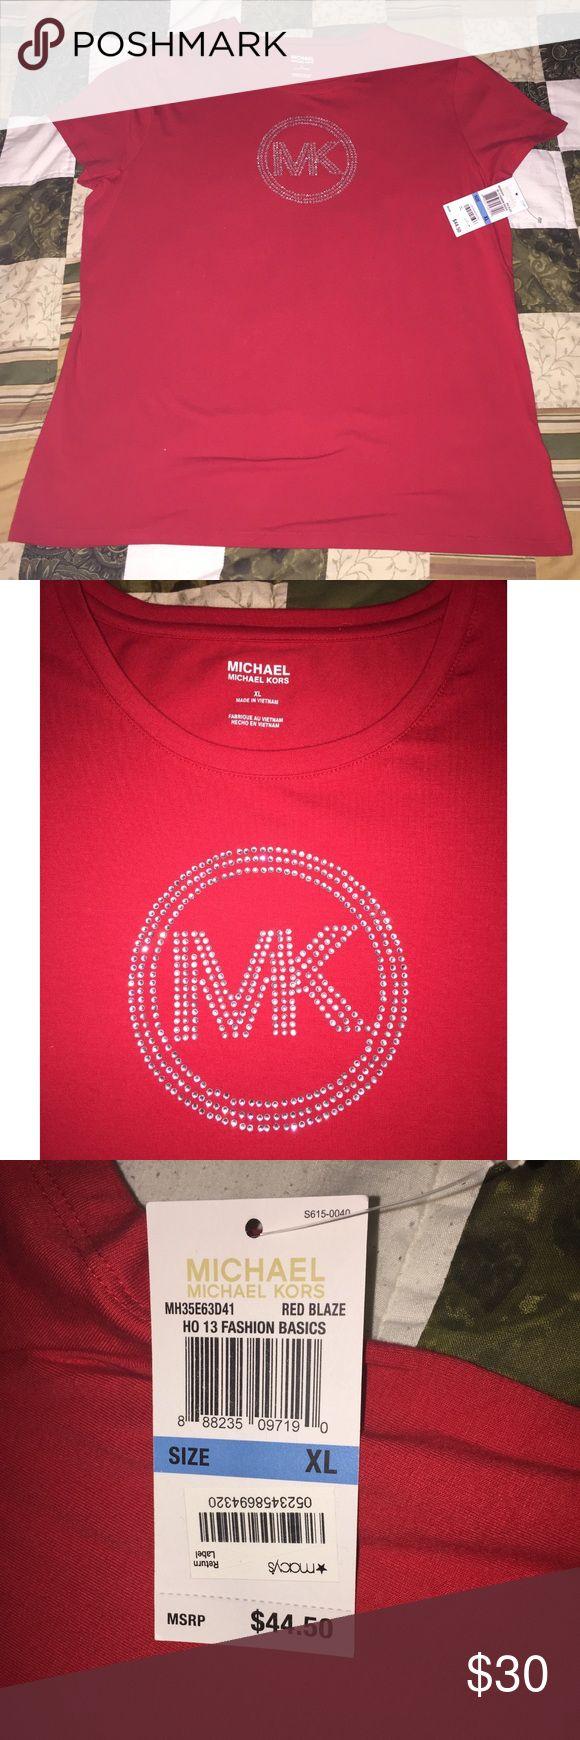 Michael Kors Red Short Sleeve T-Shirt NWT Michael Kors Red Short Sleeve T-Shirt NWT Michael Kors Tops Tees - Short Sleeve